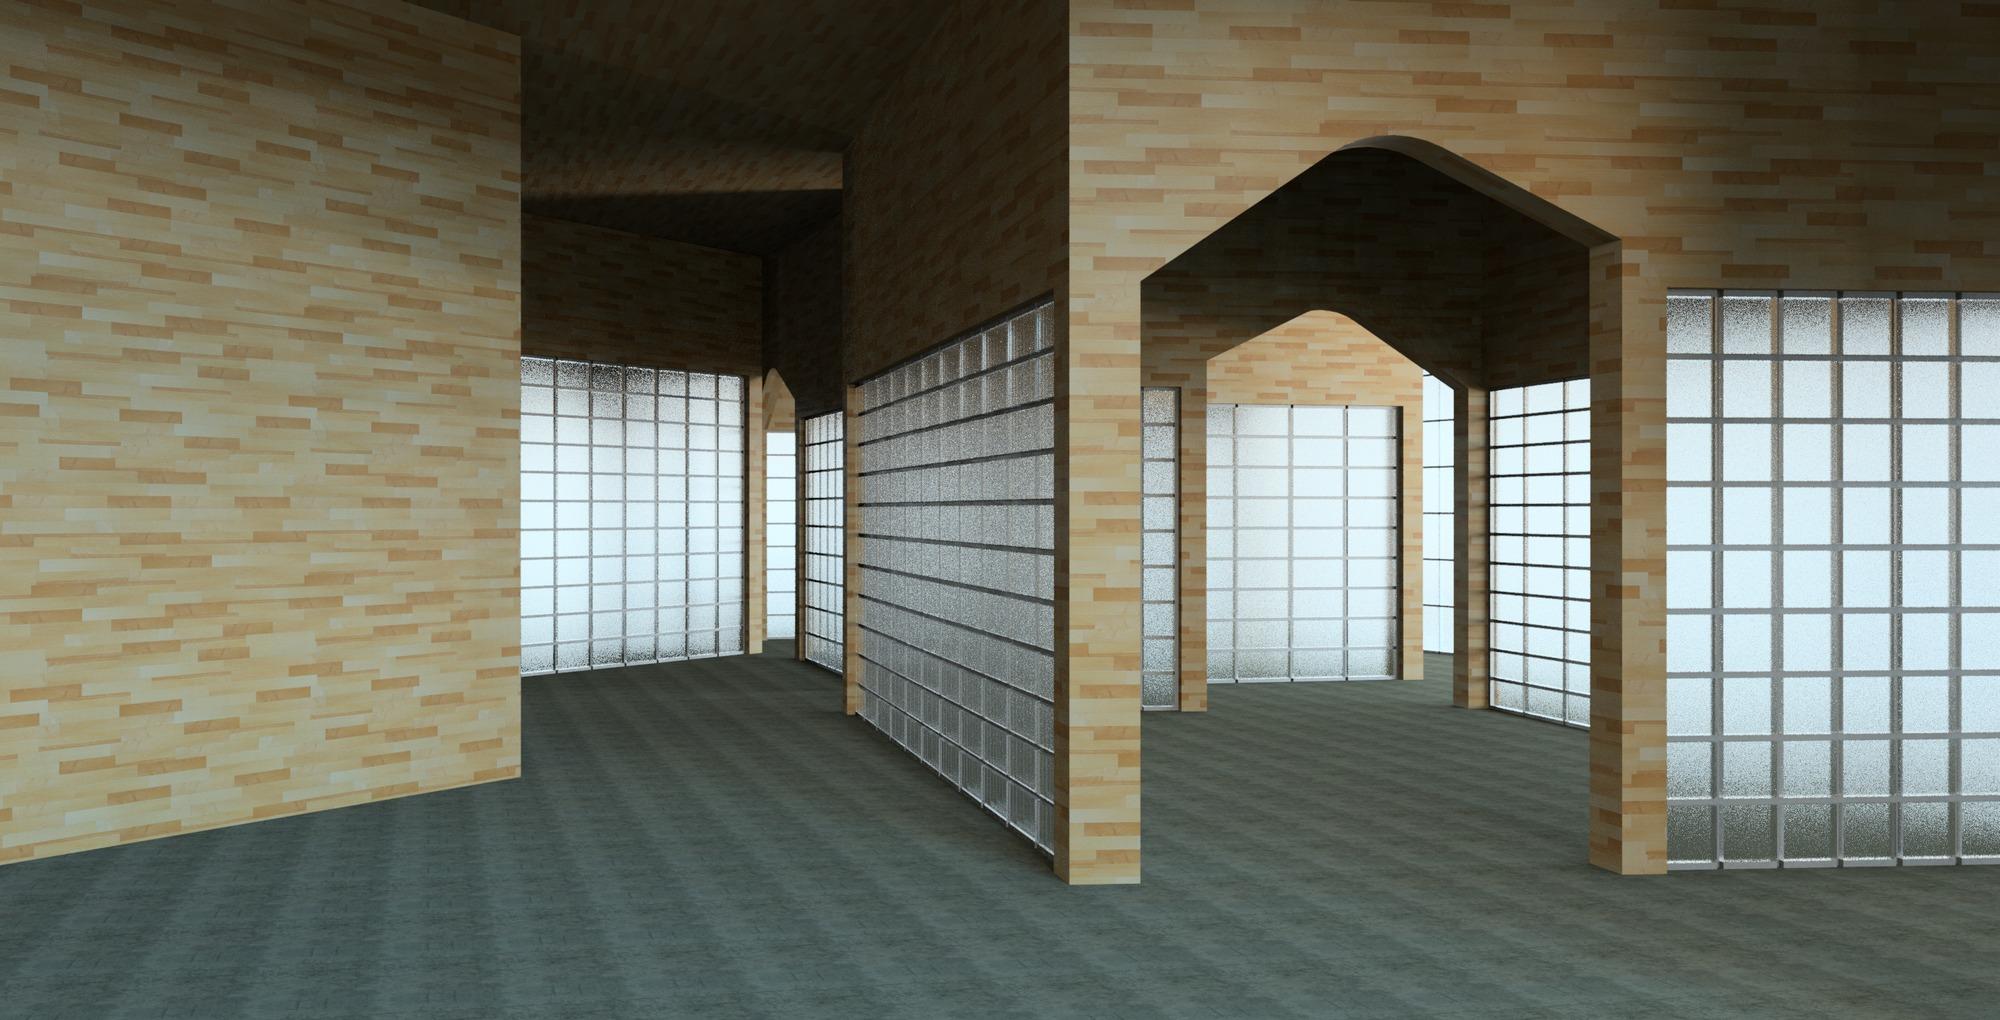 Raas-rendering20150615-2355-1o5ghqb